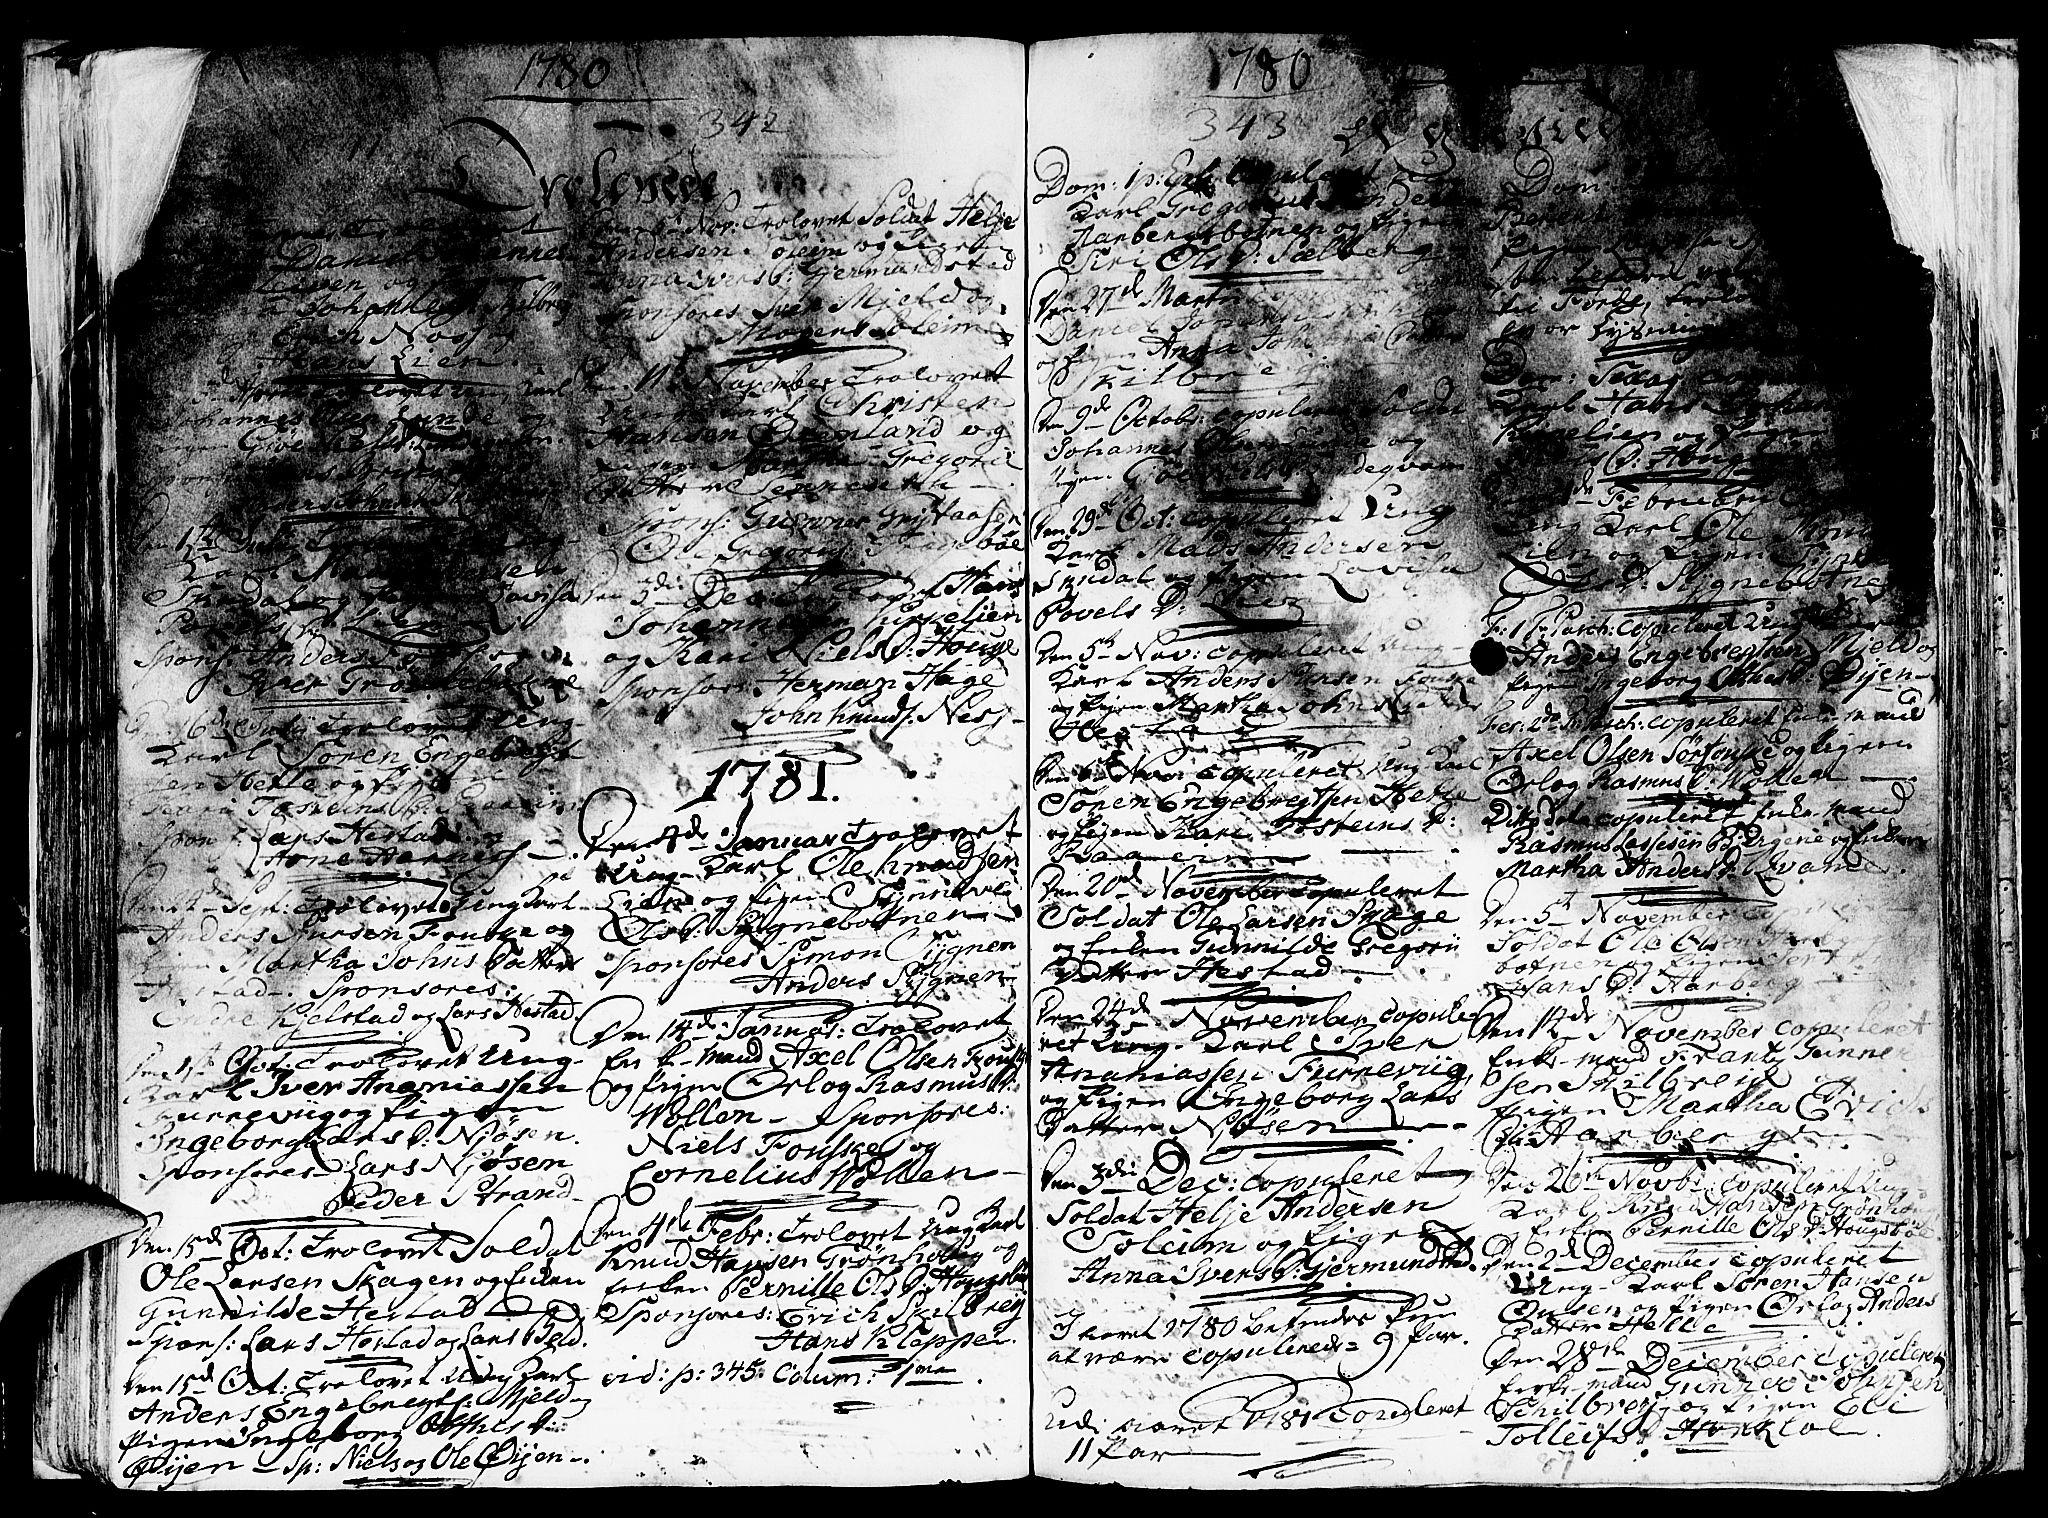 SAB, Gaular sokneprestembete, H/Haa: Ministerialbok nr. A 1, 1755-1785, s. 87